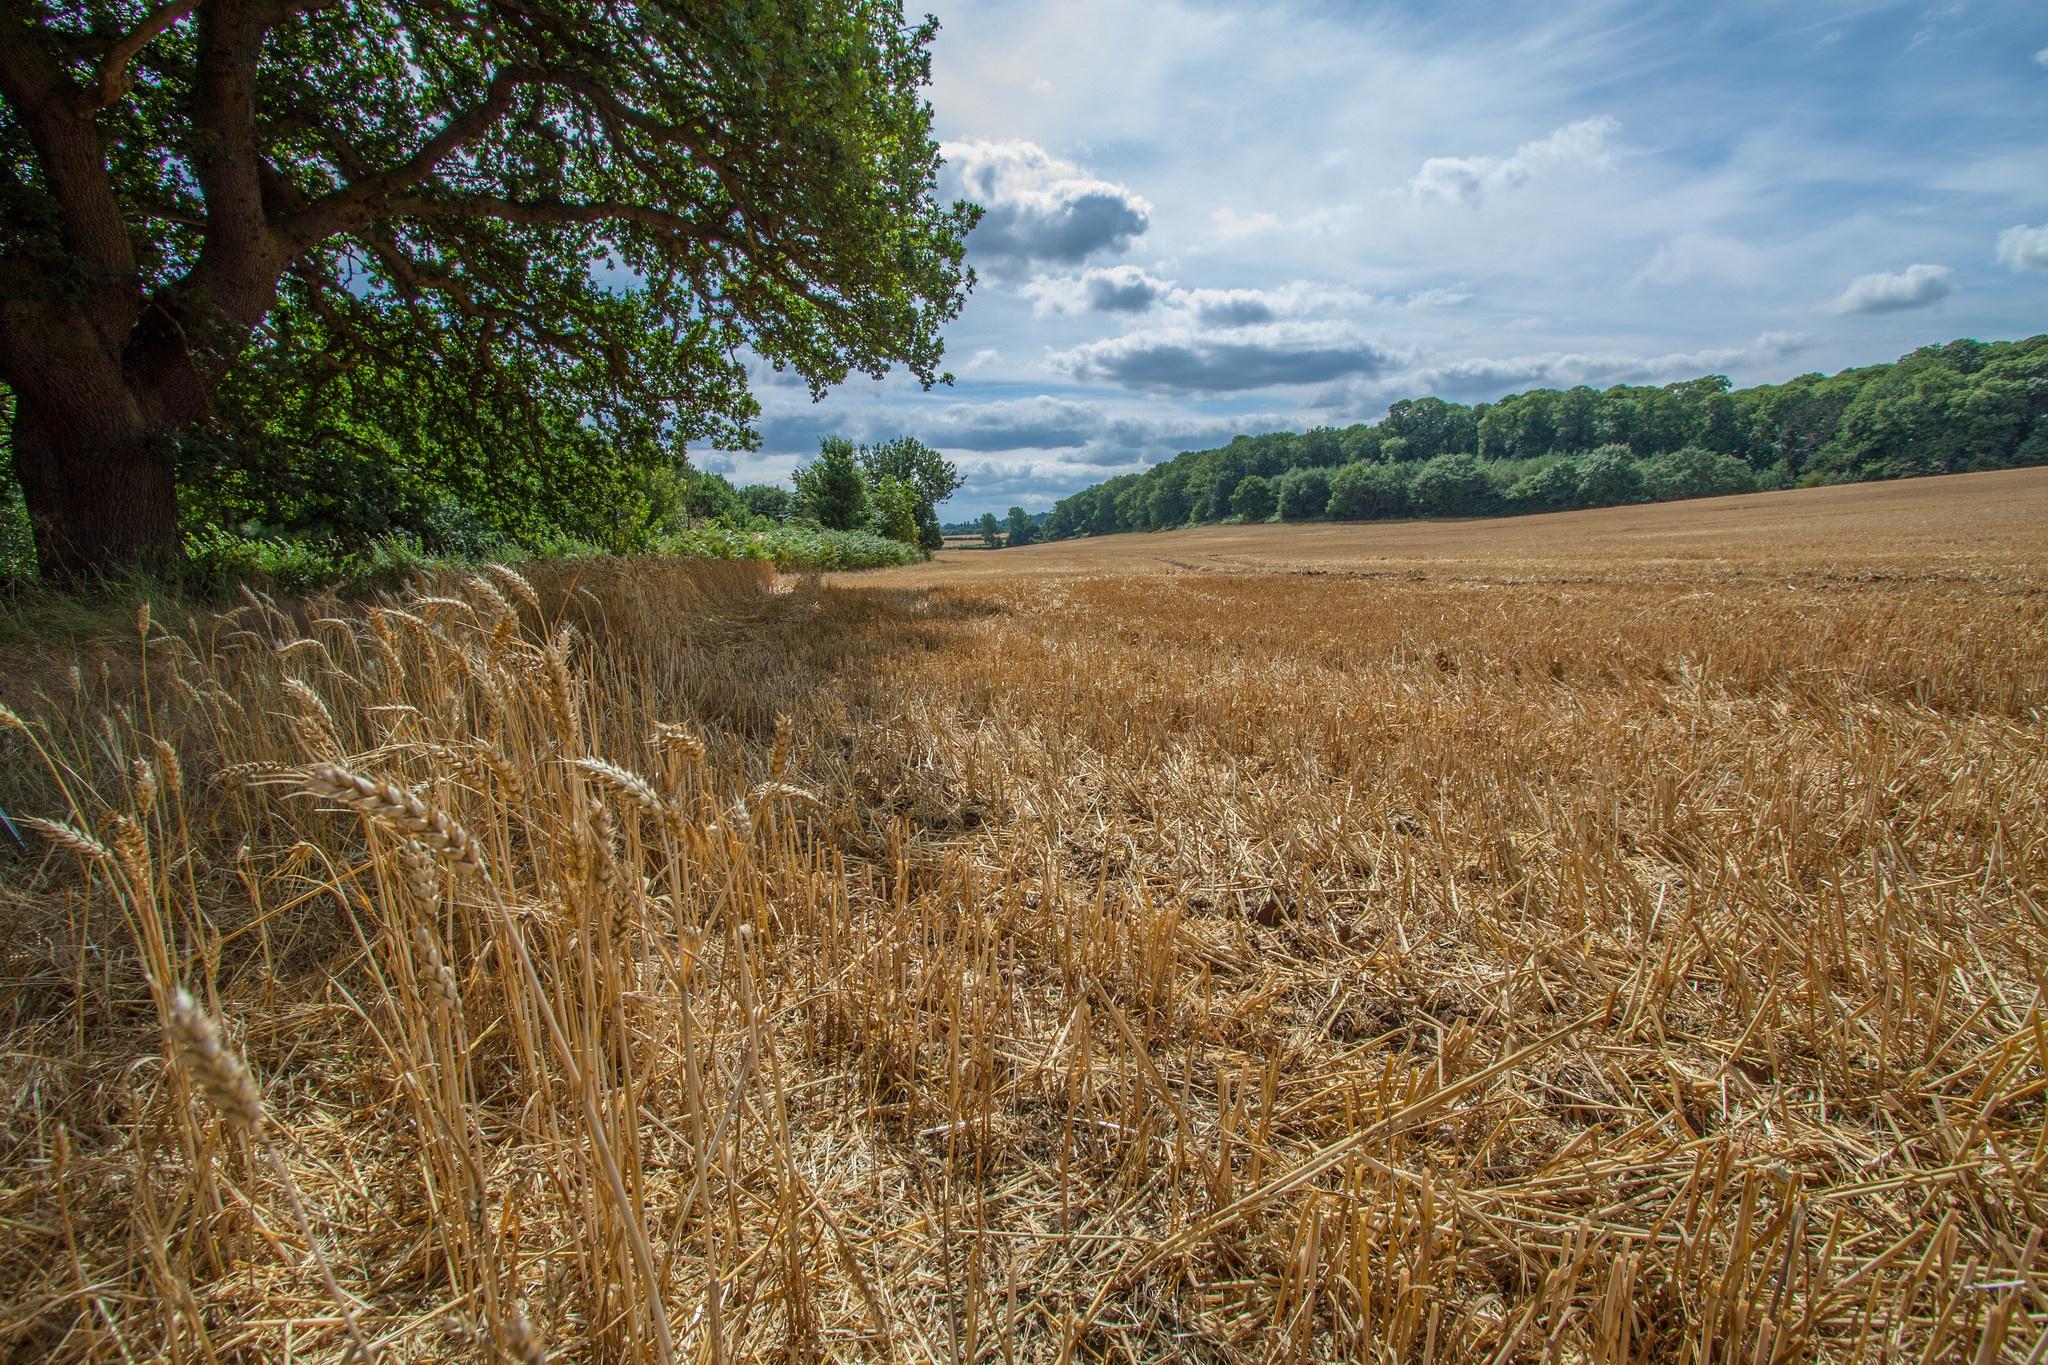 After the harvest by Jeremy Tilston